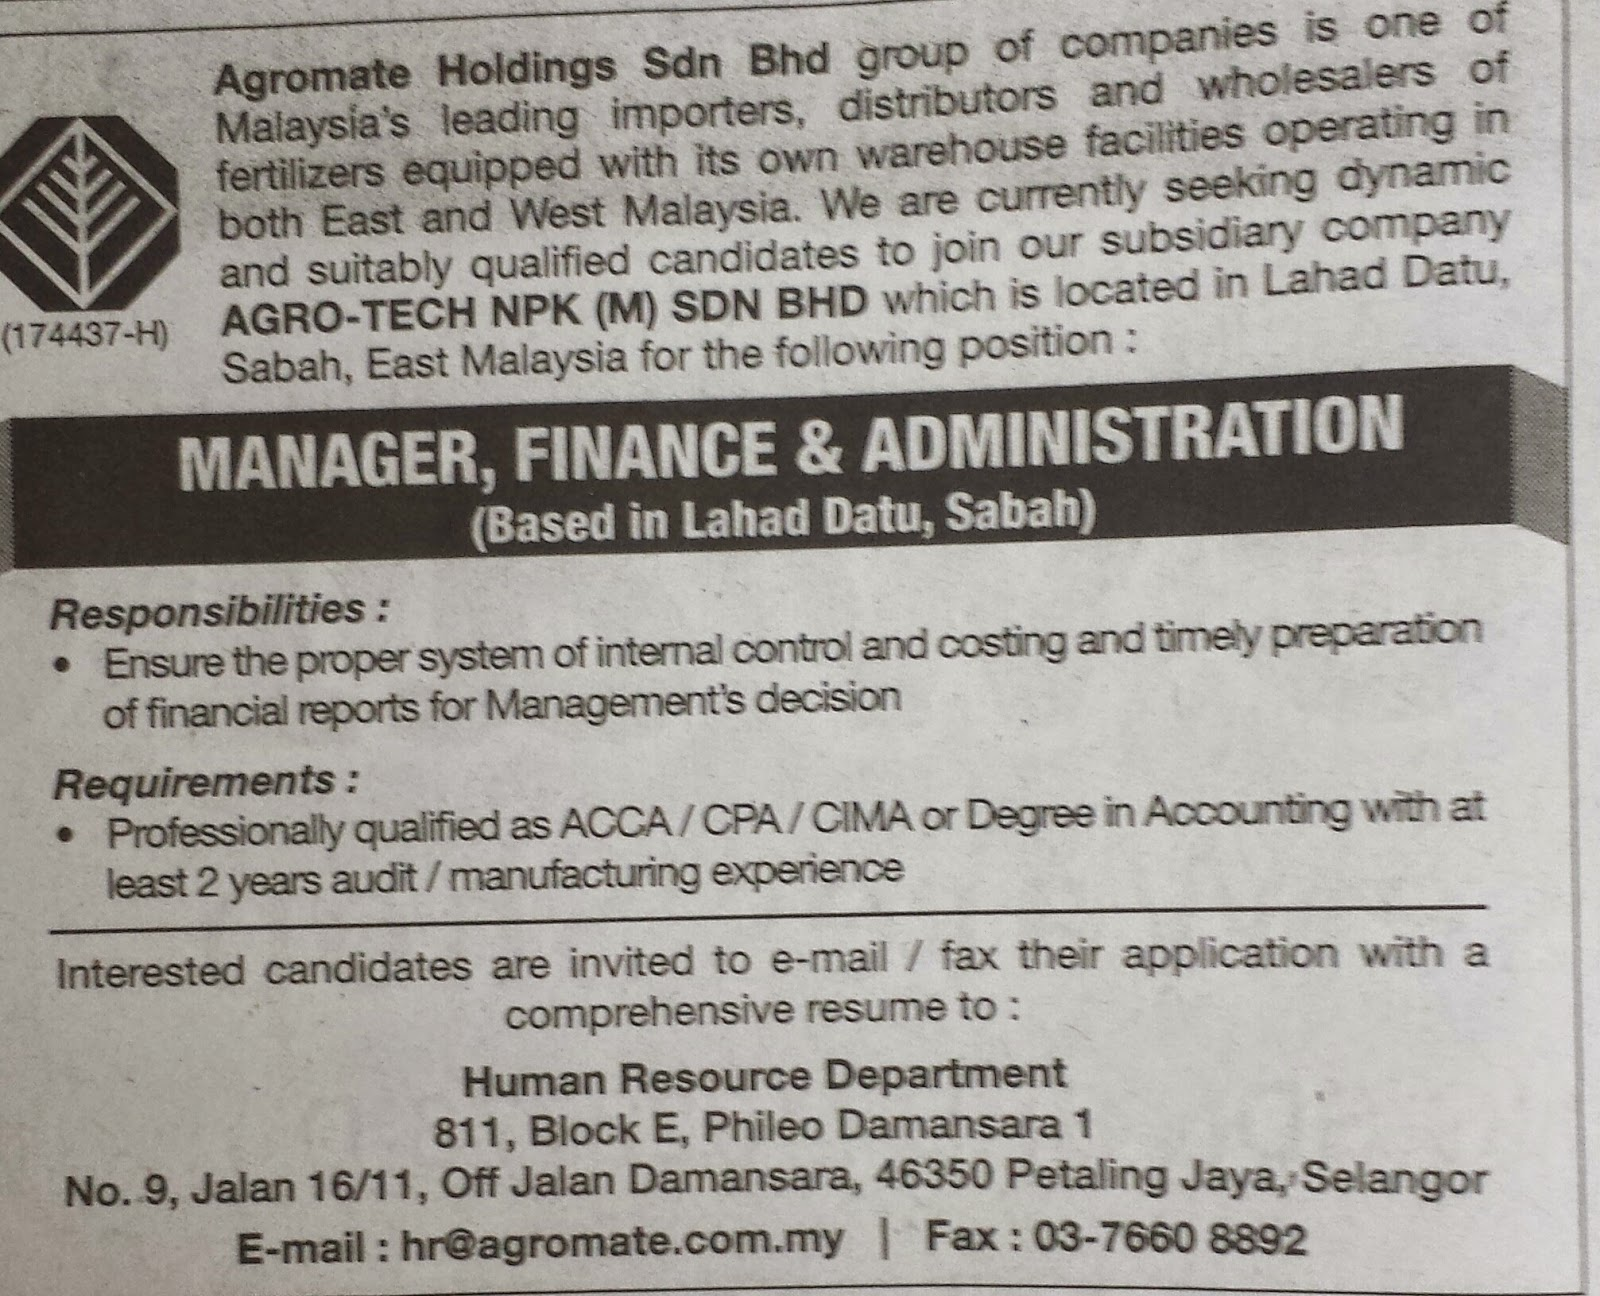 Karier Kini : Vacancy - Agromate Holdings Sdn Bhd